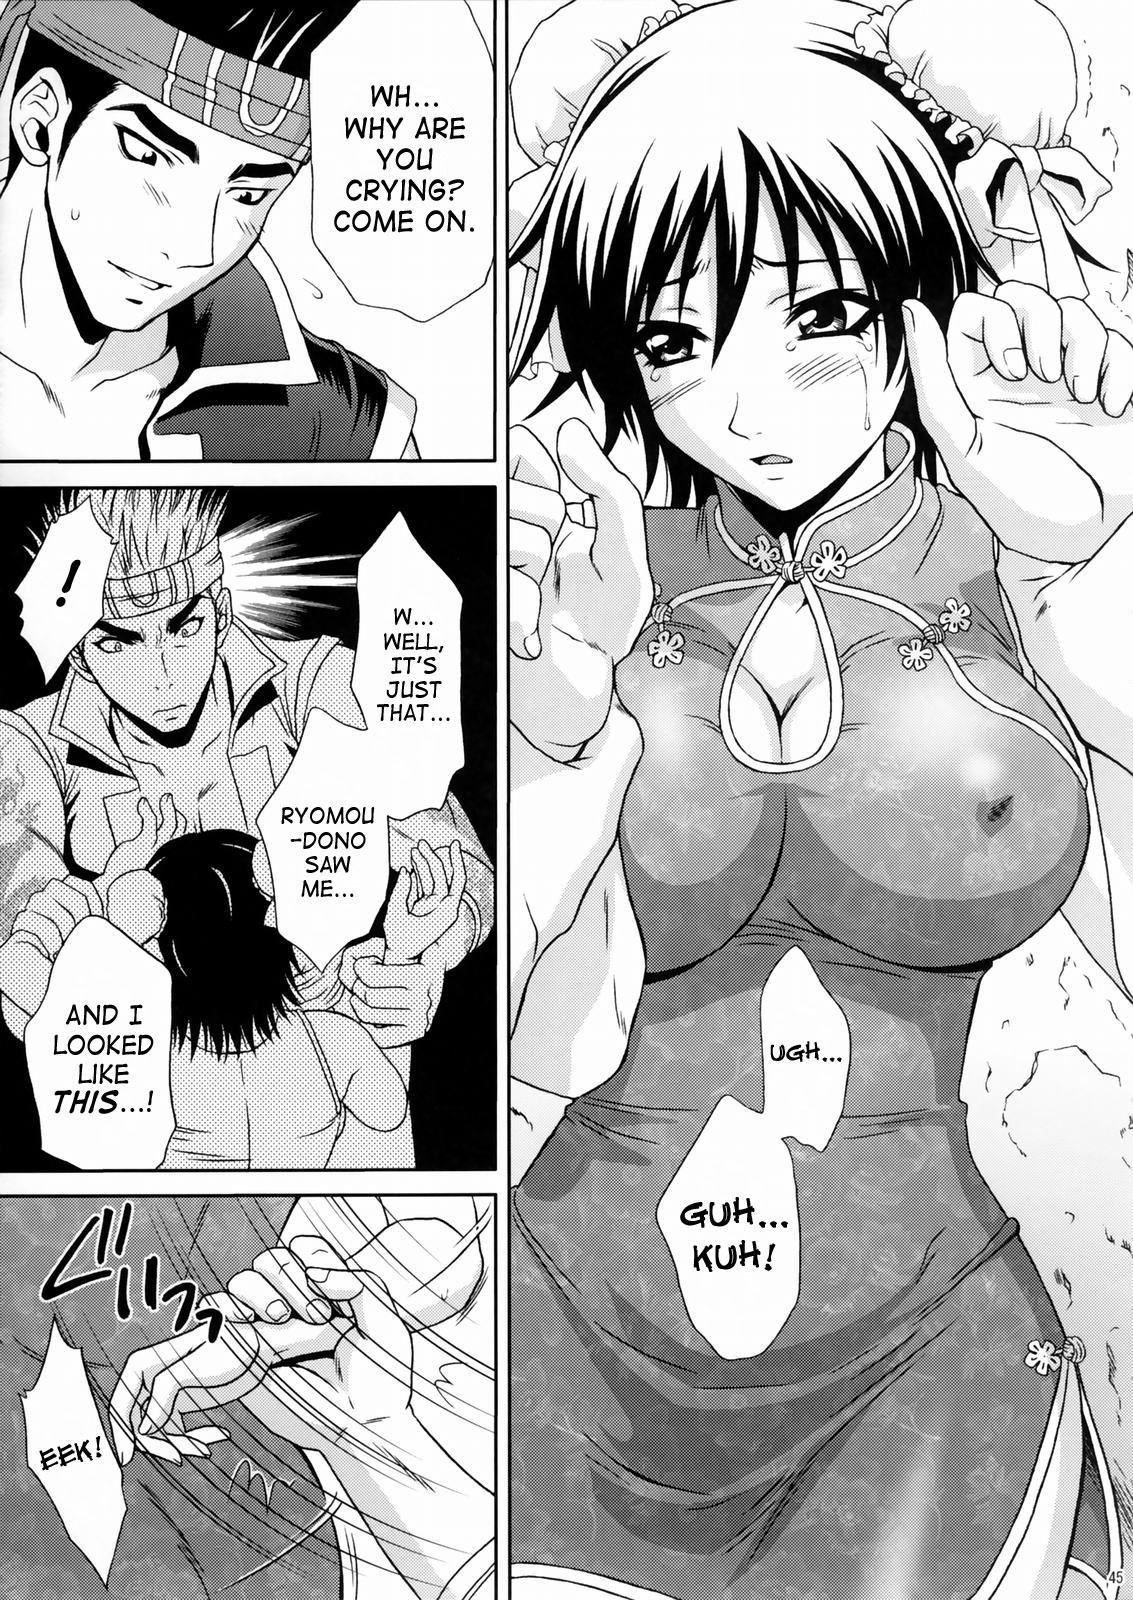 (C66) [U.R.C (Momoya Show-Neko)] Rikuson-chan ~Lovely Gunshi no Himitsu~ | Rikuson-chan Secret of The Lovely Strategist (Dynasty Warriors) [English] [SaHa] 43